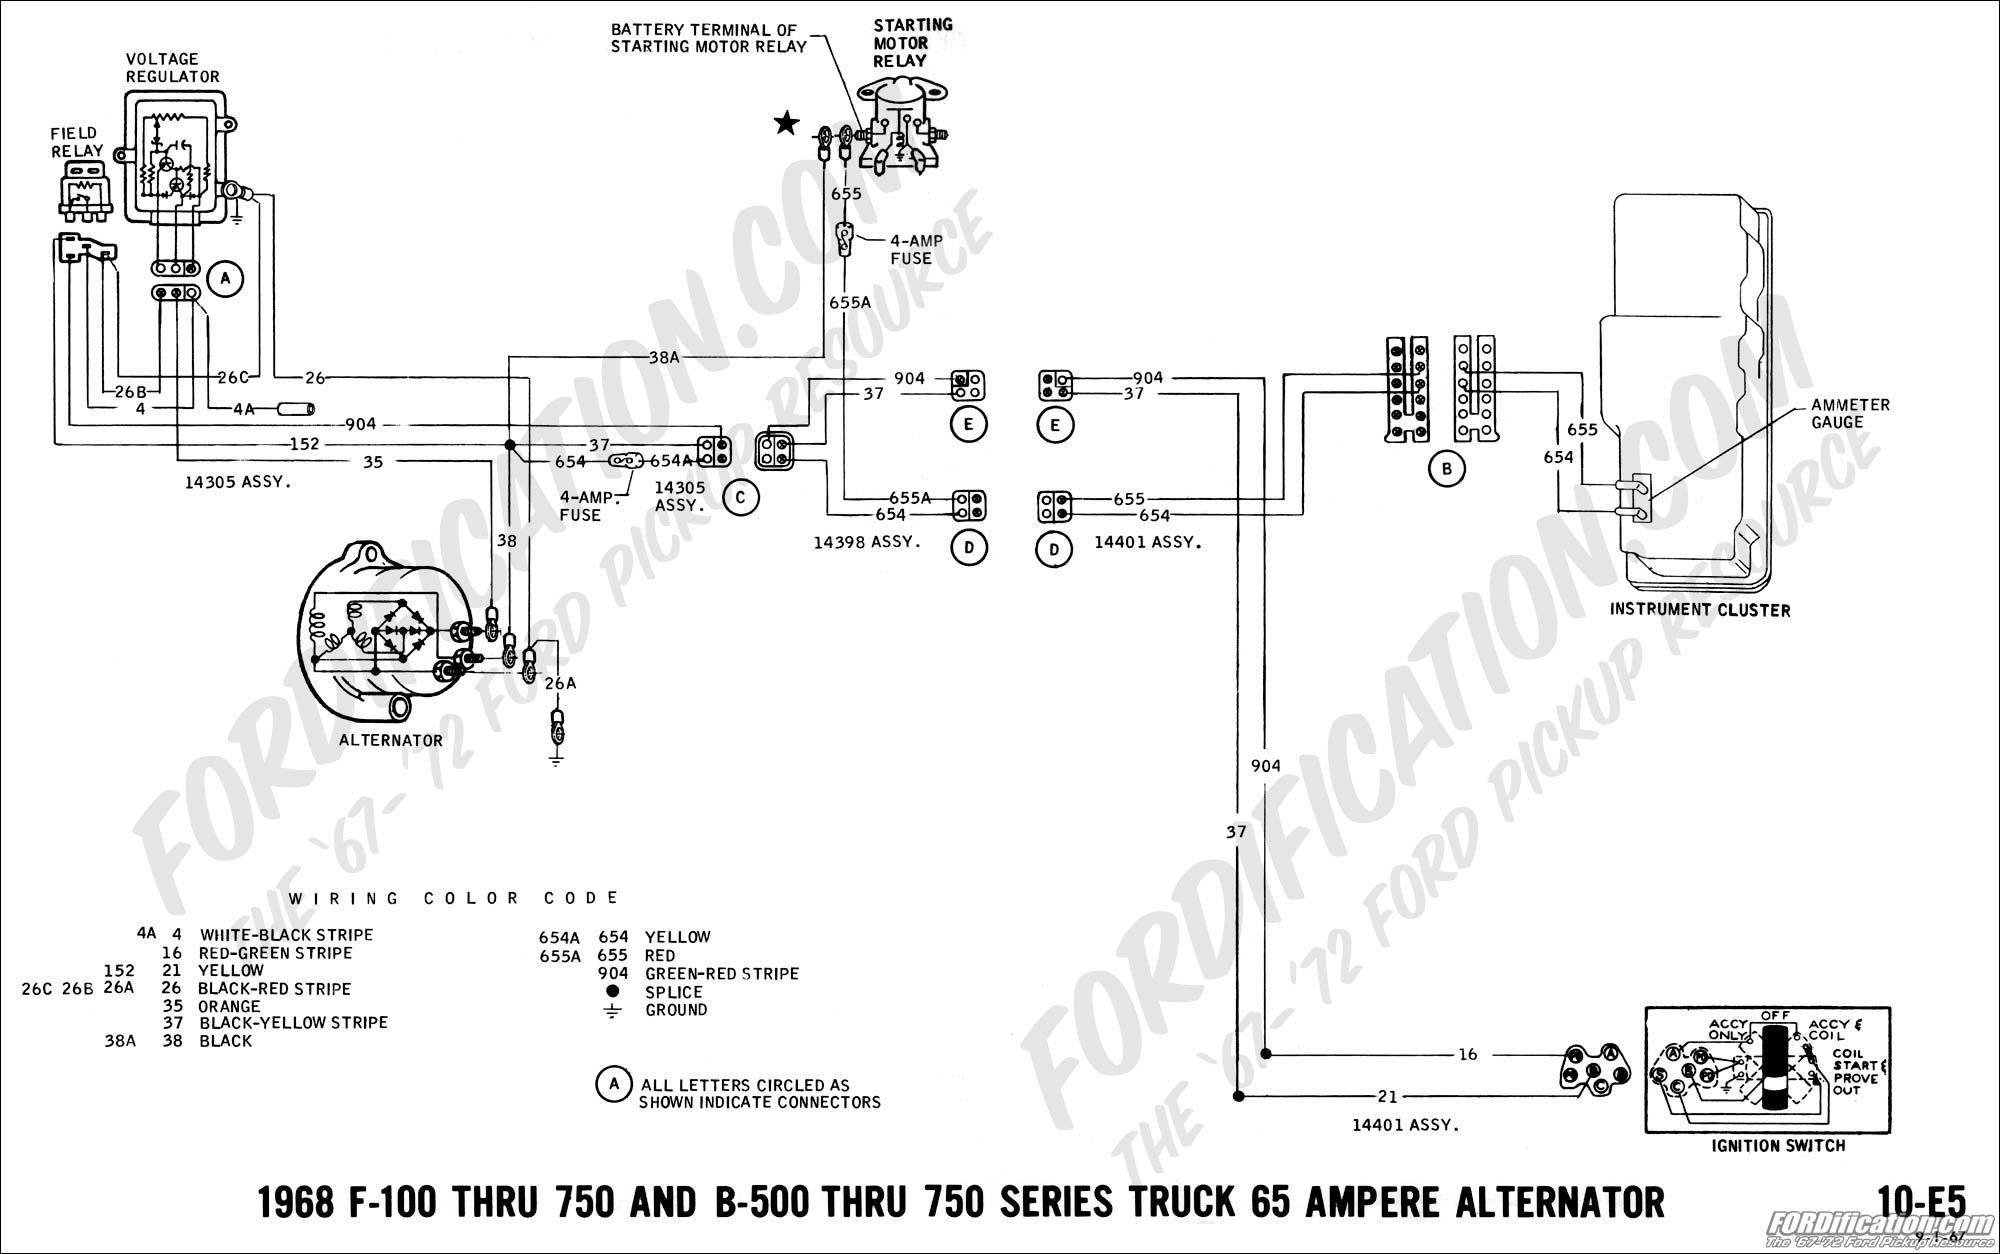 leece neville alternator wiring diagram free download leece neville alternator wiring diagram free download wiring  leece neville alternator wiring diagram